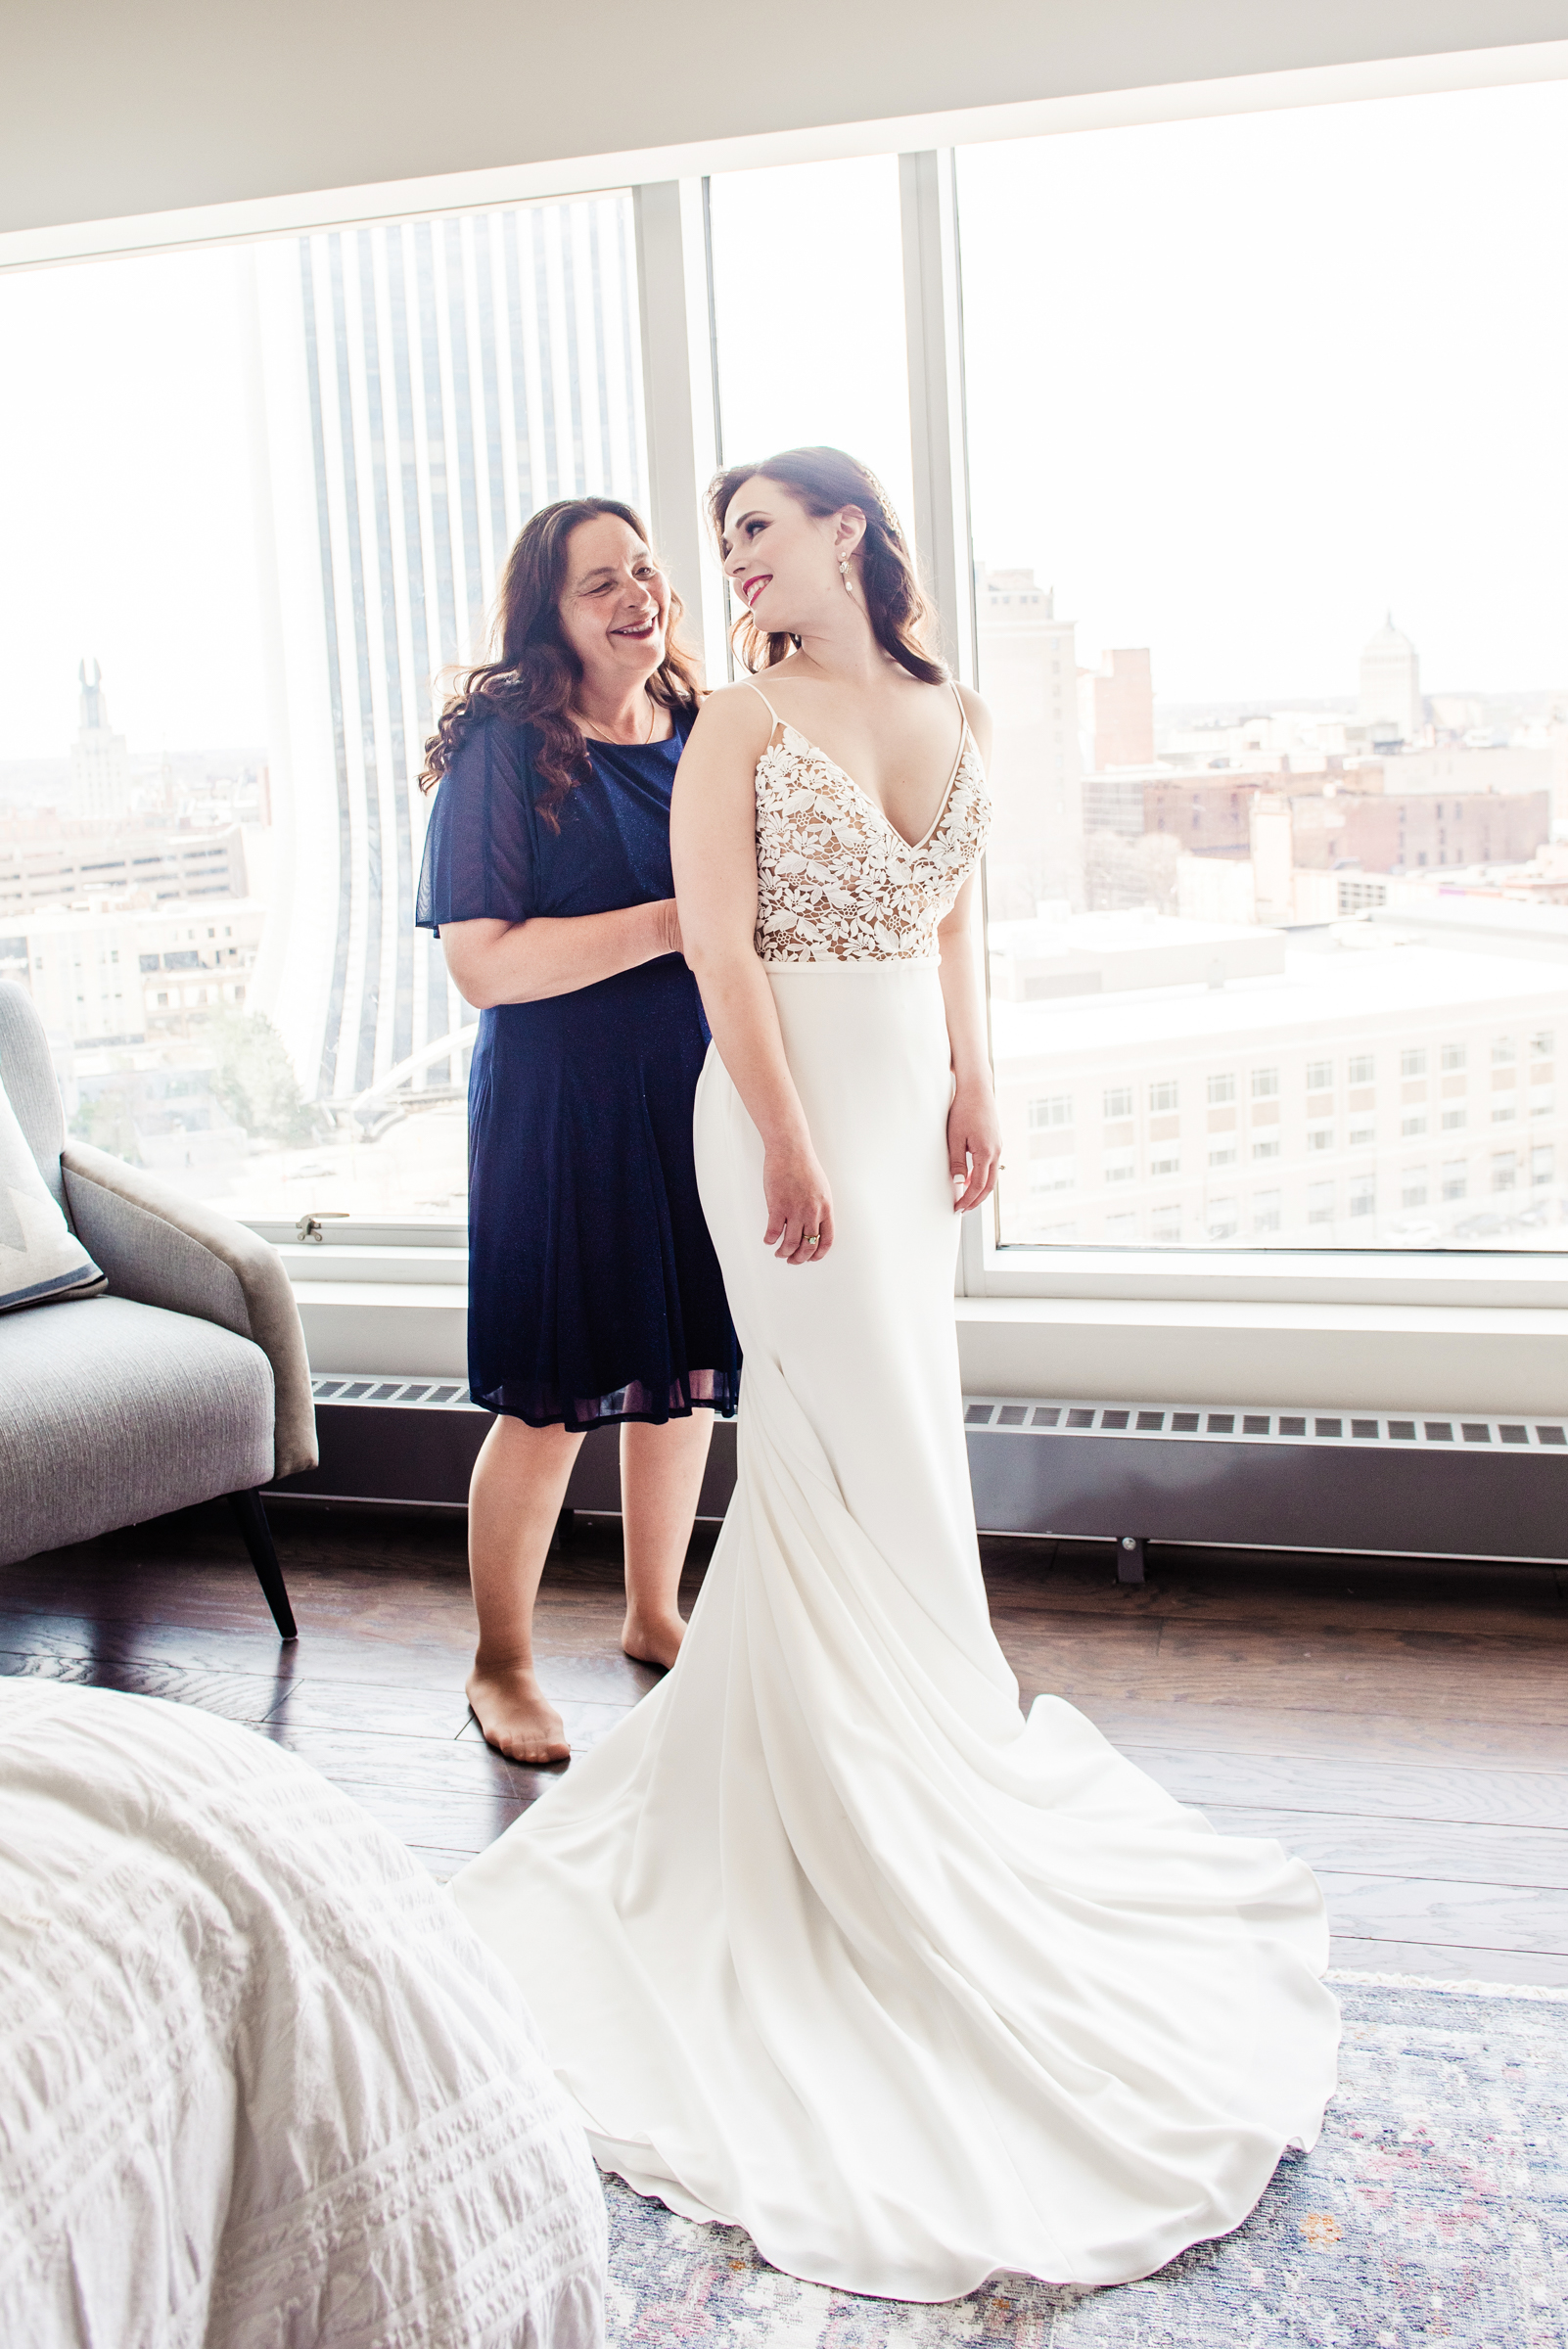 The_Arbor_LoftRochester_Wedding_JILL_STUDIO_Rochester_NY_Photographer_140350.jpg